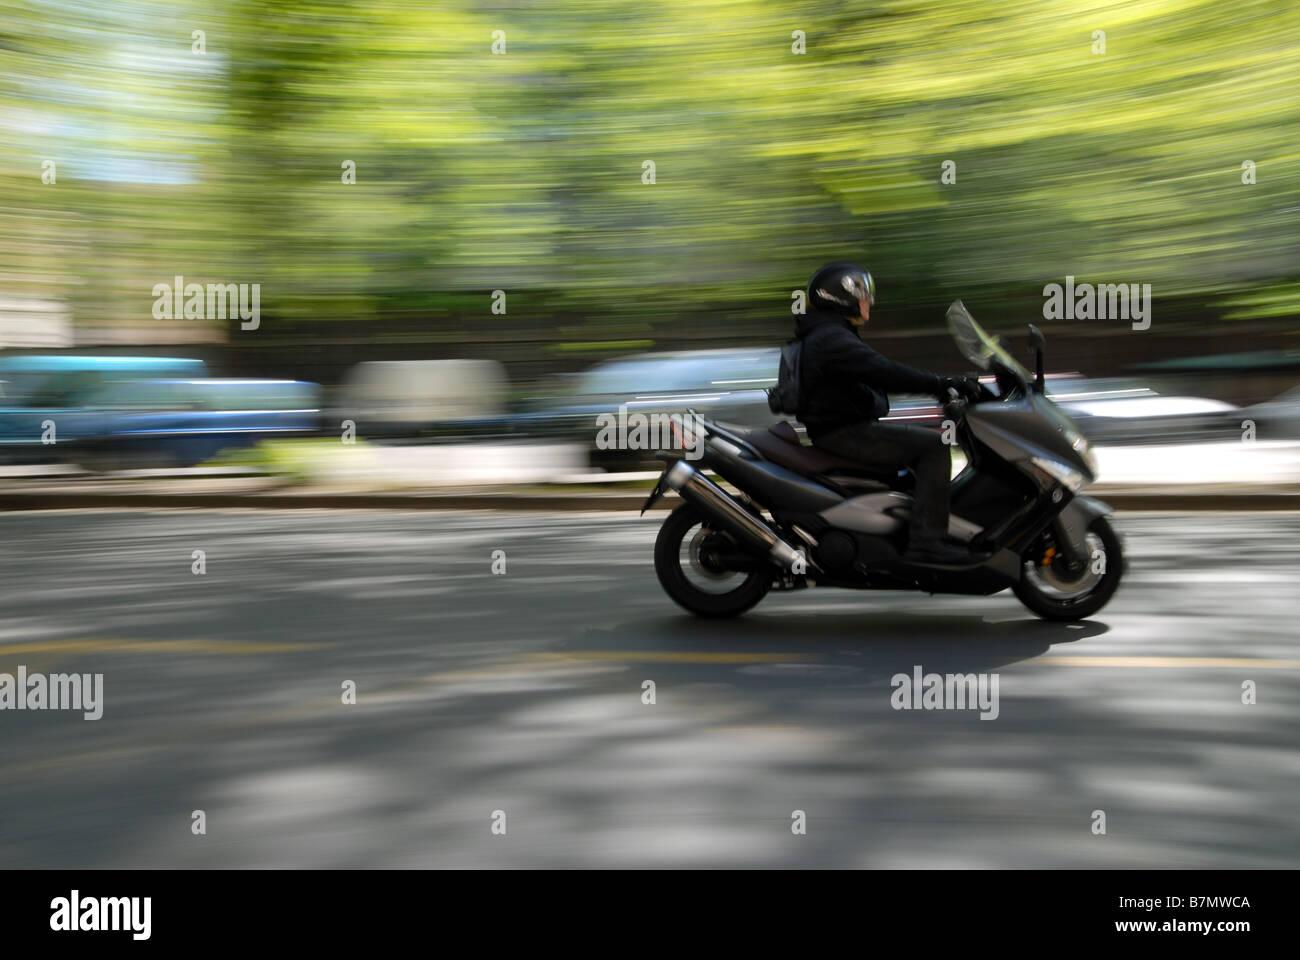 A scooter rider on Corso Galileo Ferraris, Turin, Piedmont, Italy. - Stock Image